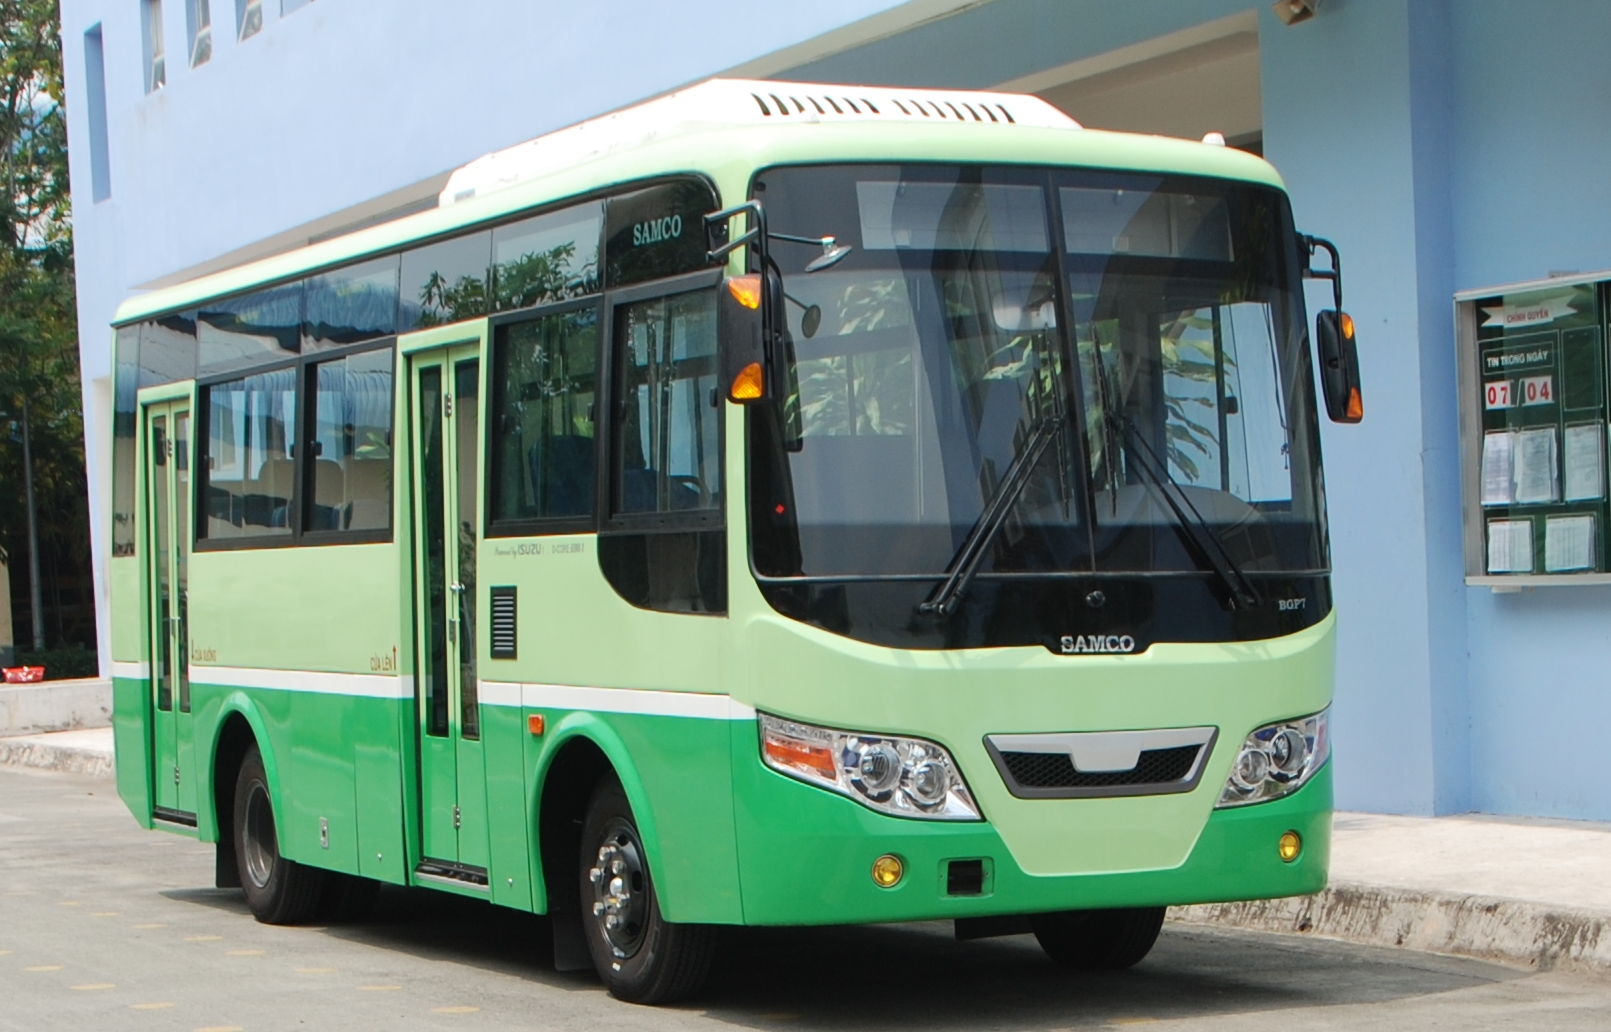 hmt-b40-samco-6